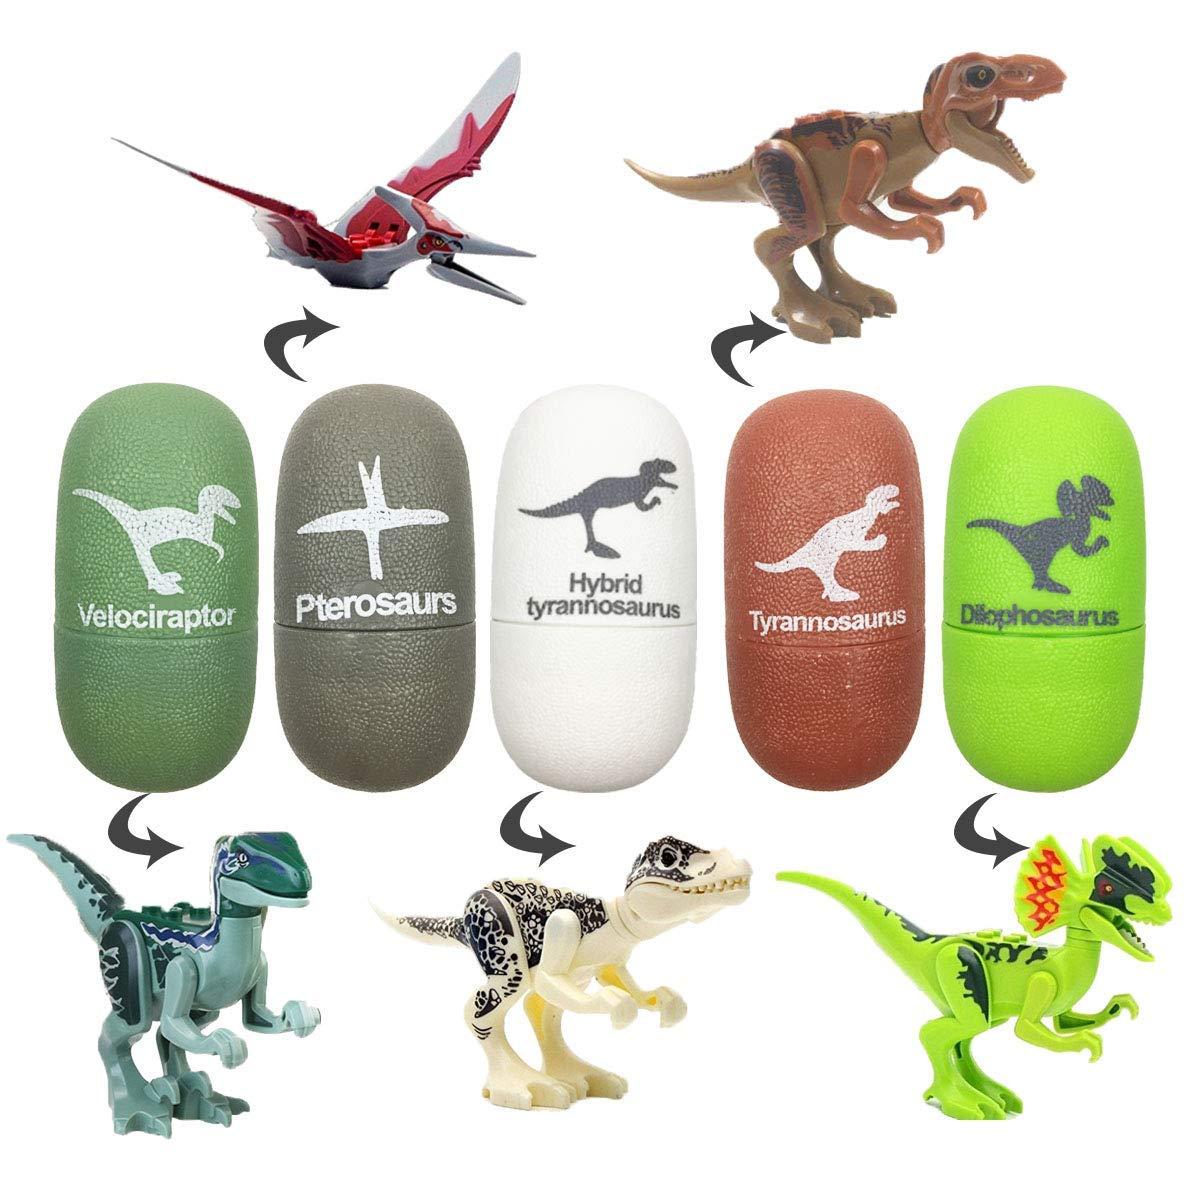 Jofan Dinosaur Building Toddlers Stuffers